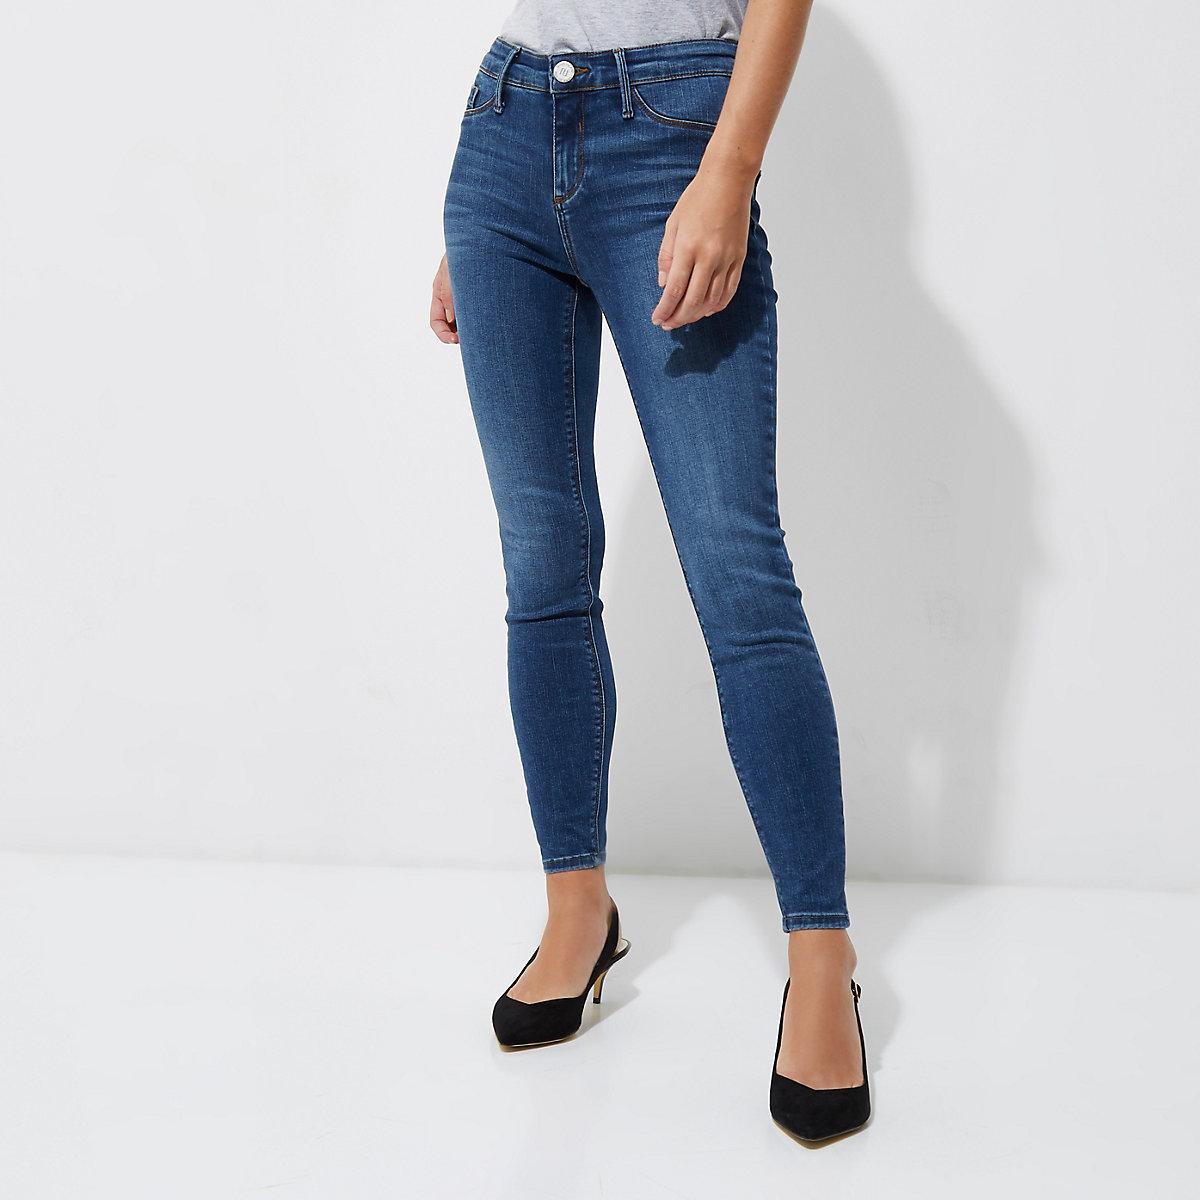 e9e991f64c0 Petite mid blue wash Molly skinny jeggings - Jeggings - Jeans - women